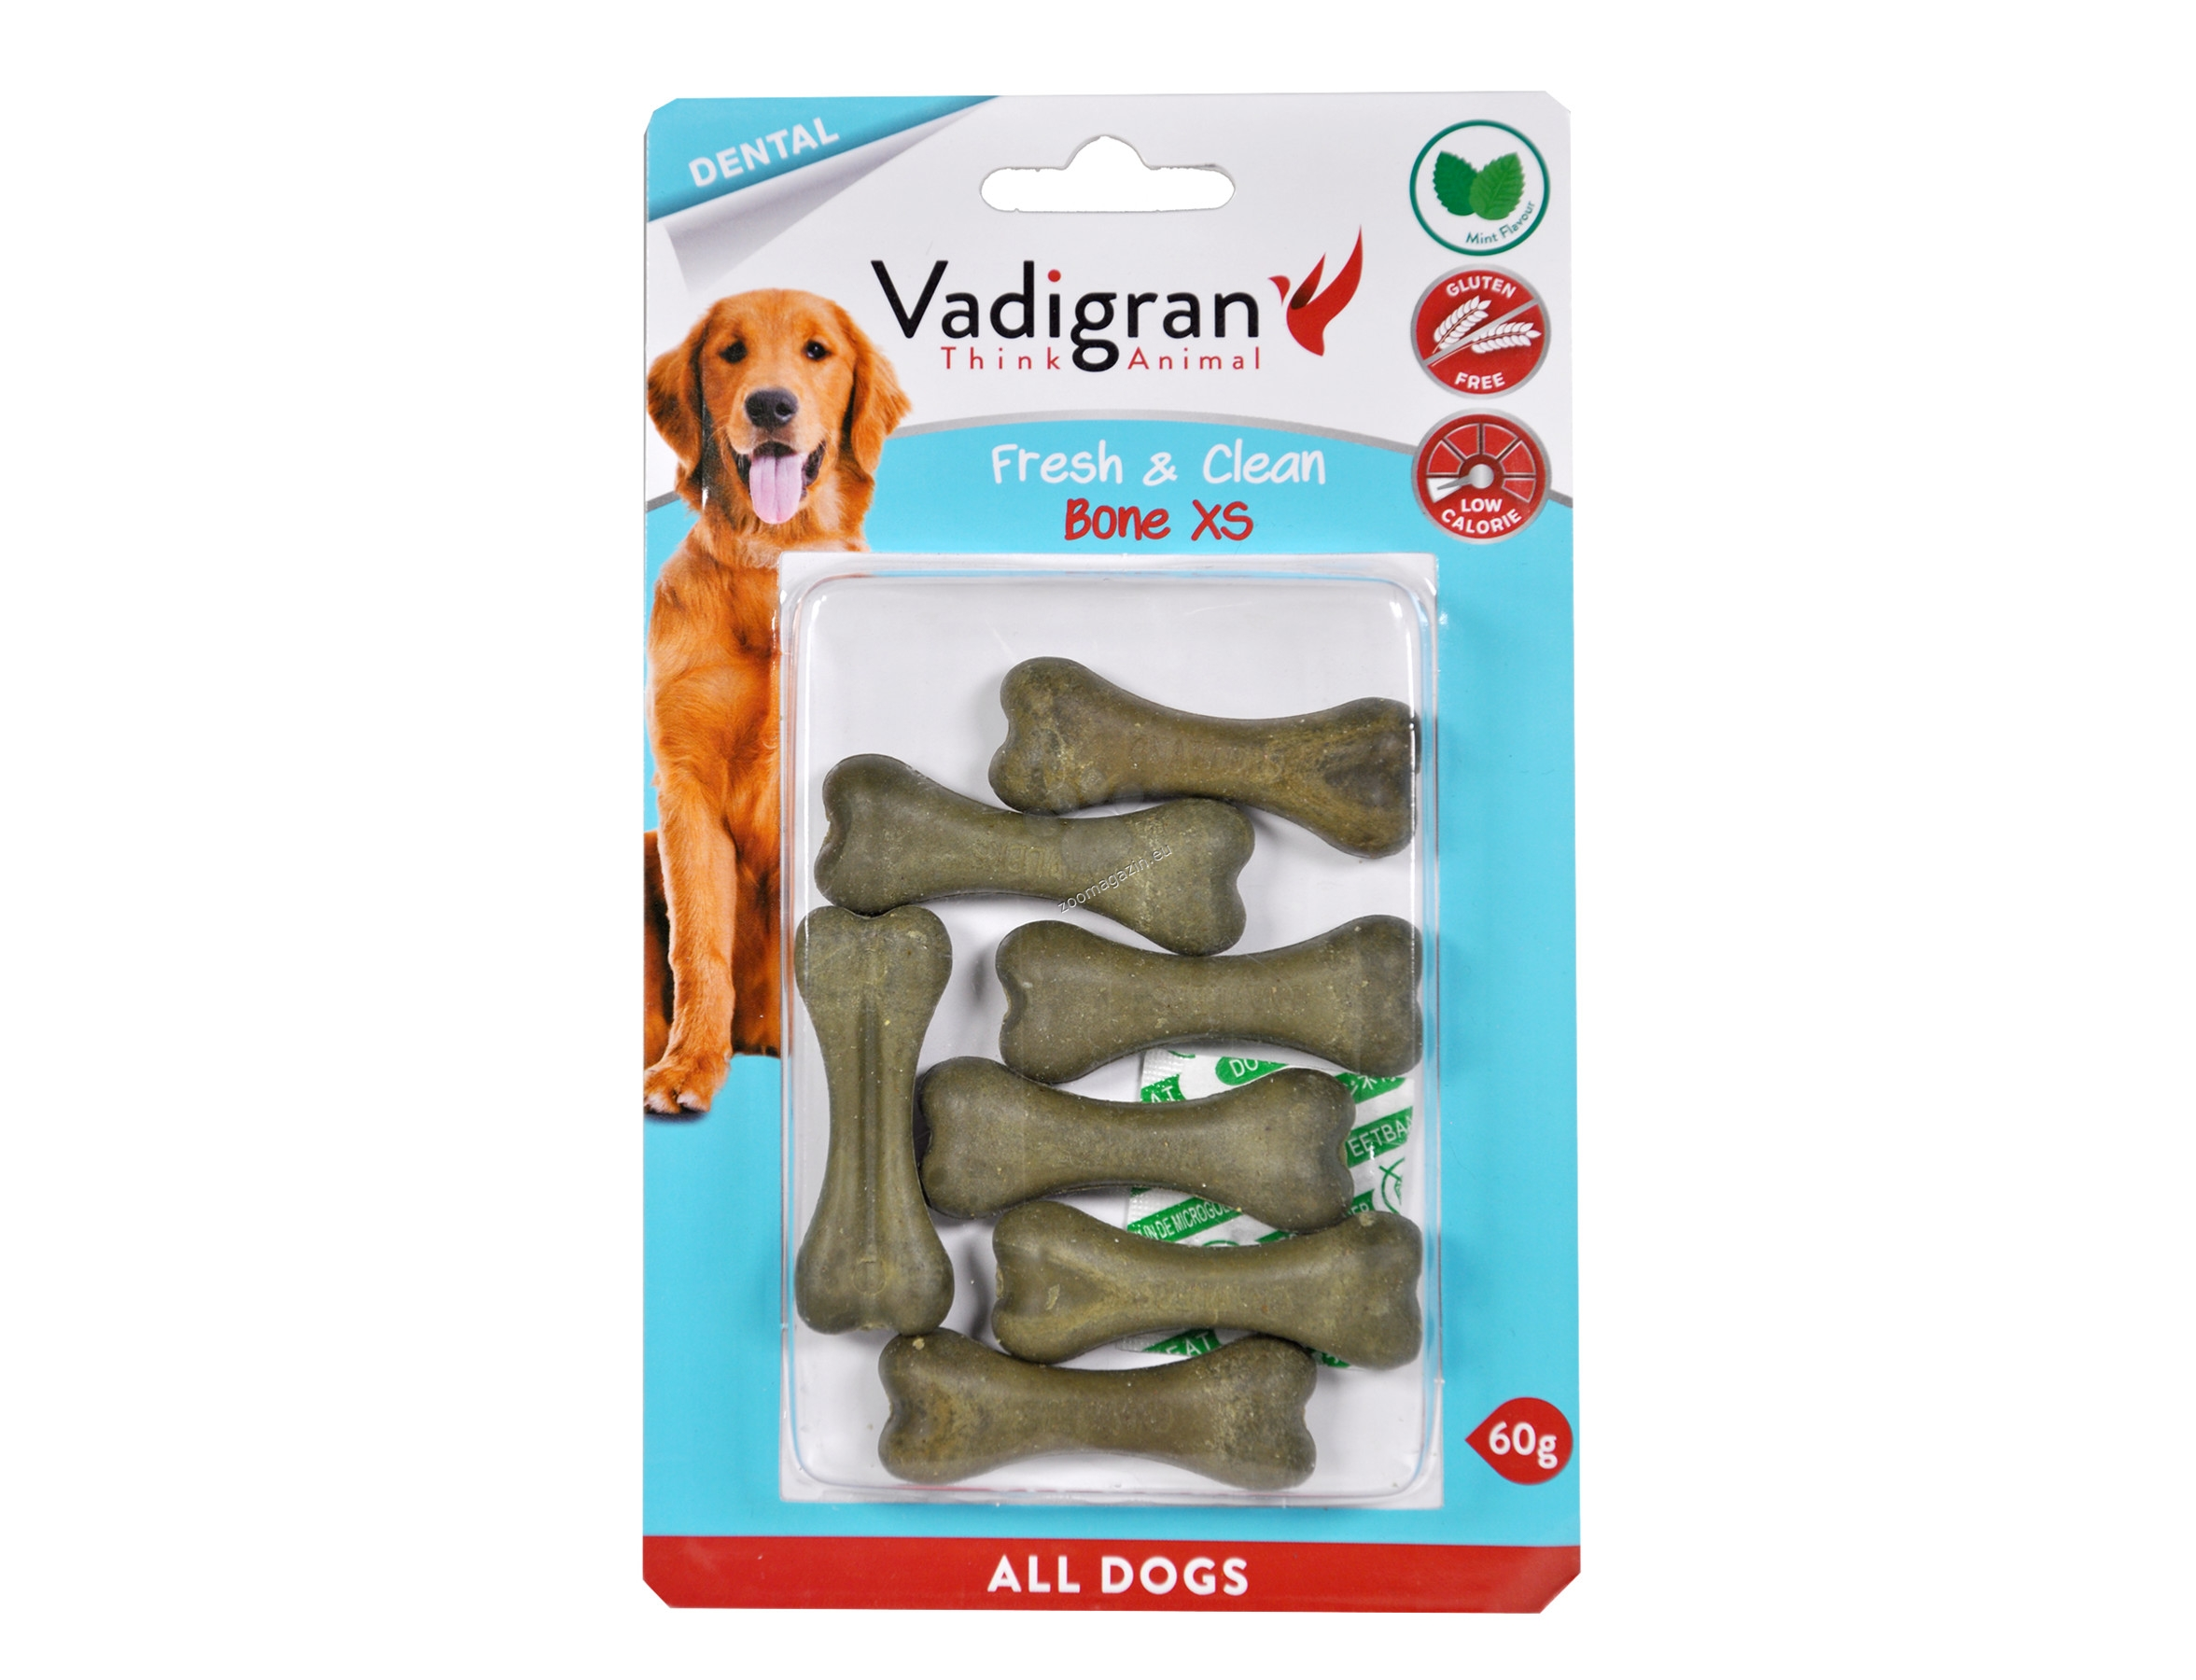 Vadigran - Pressed Chewbone Fresh&Clean - кокалче за здрави зъби, висока устна хигиена и свеж дъх 60 гр. / 5.5 см.